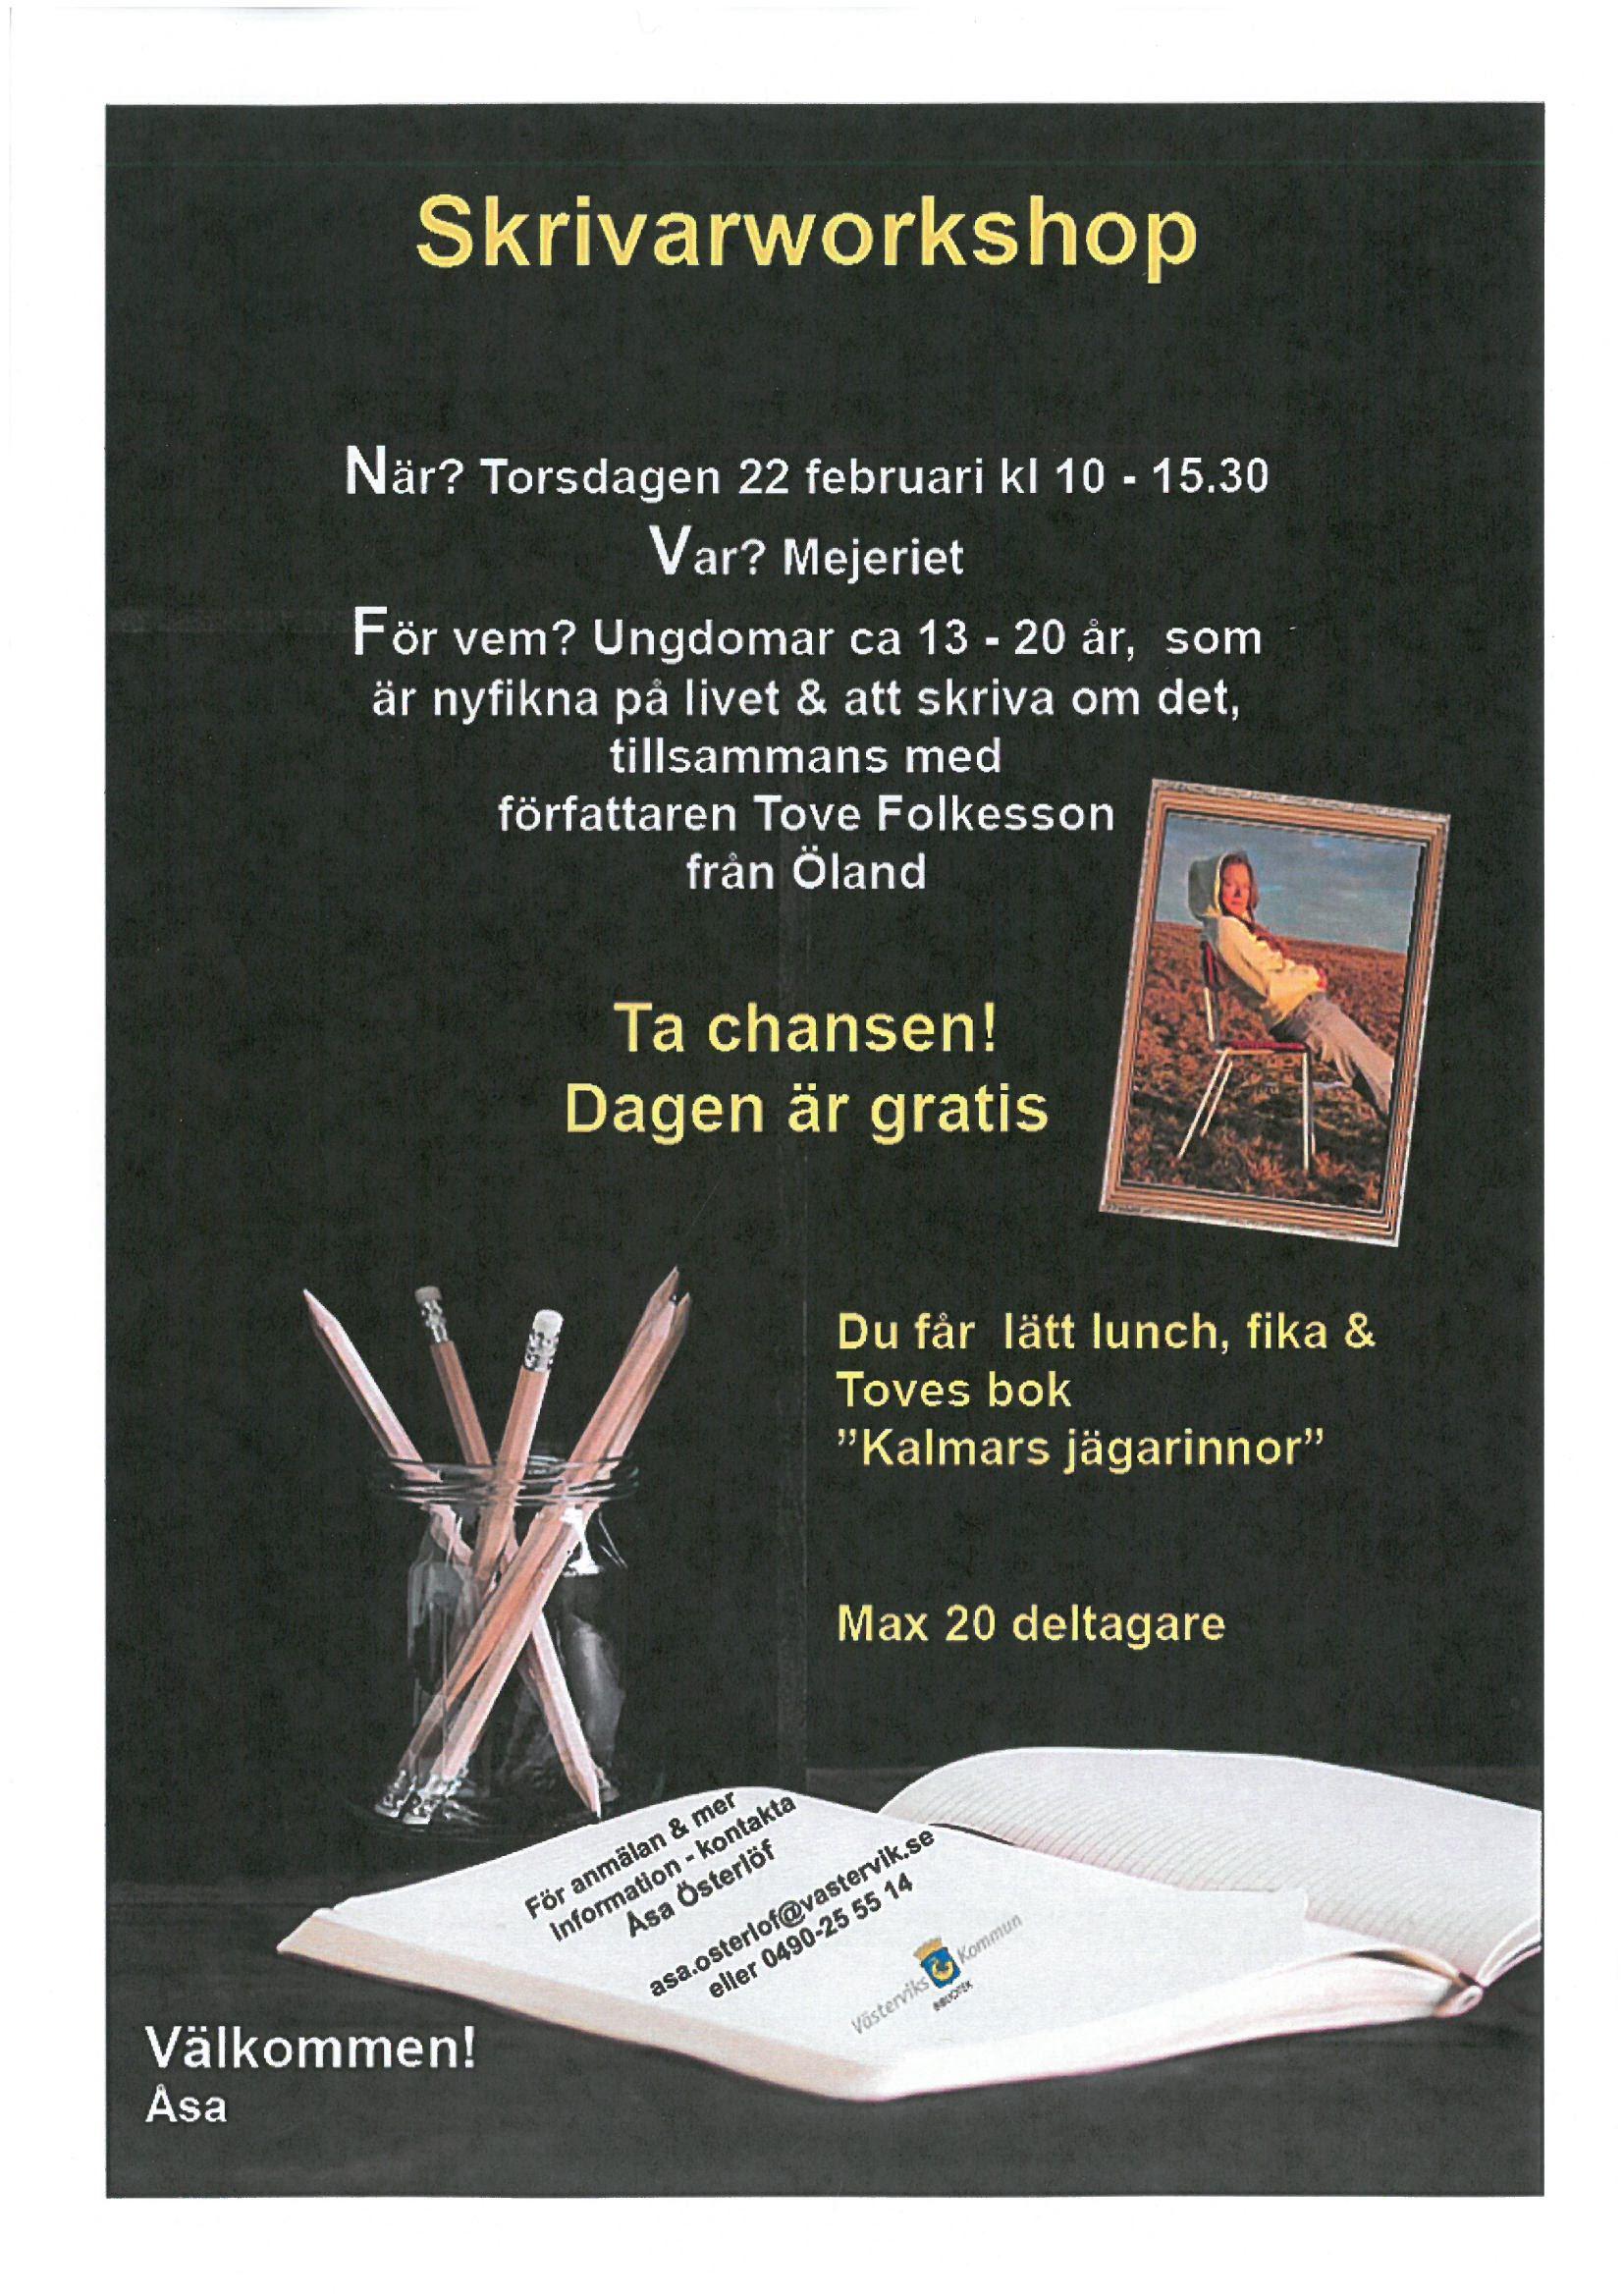 Skrivarworkshop på Mejeriet i Västervik